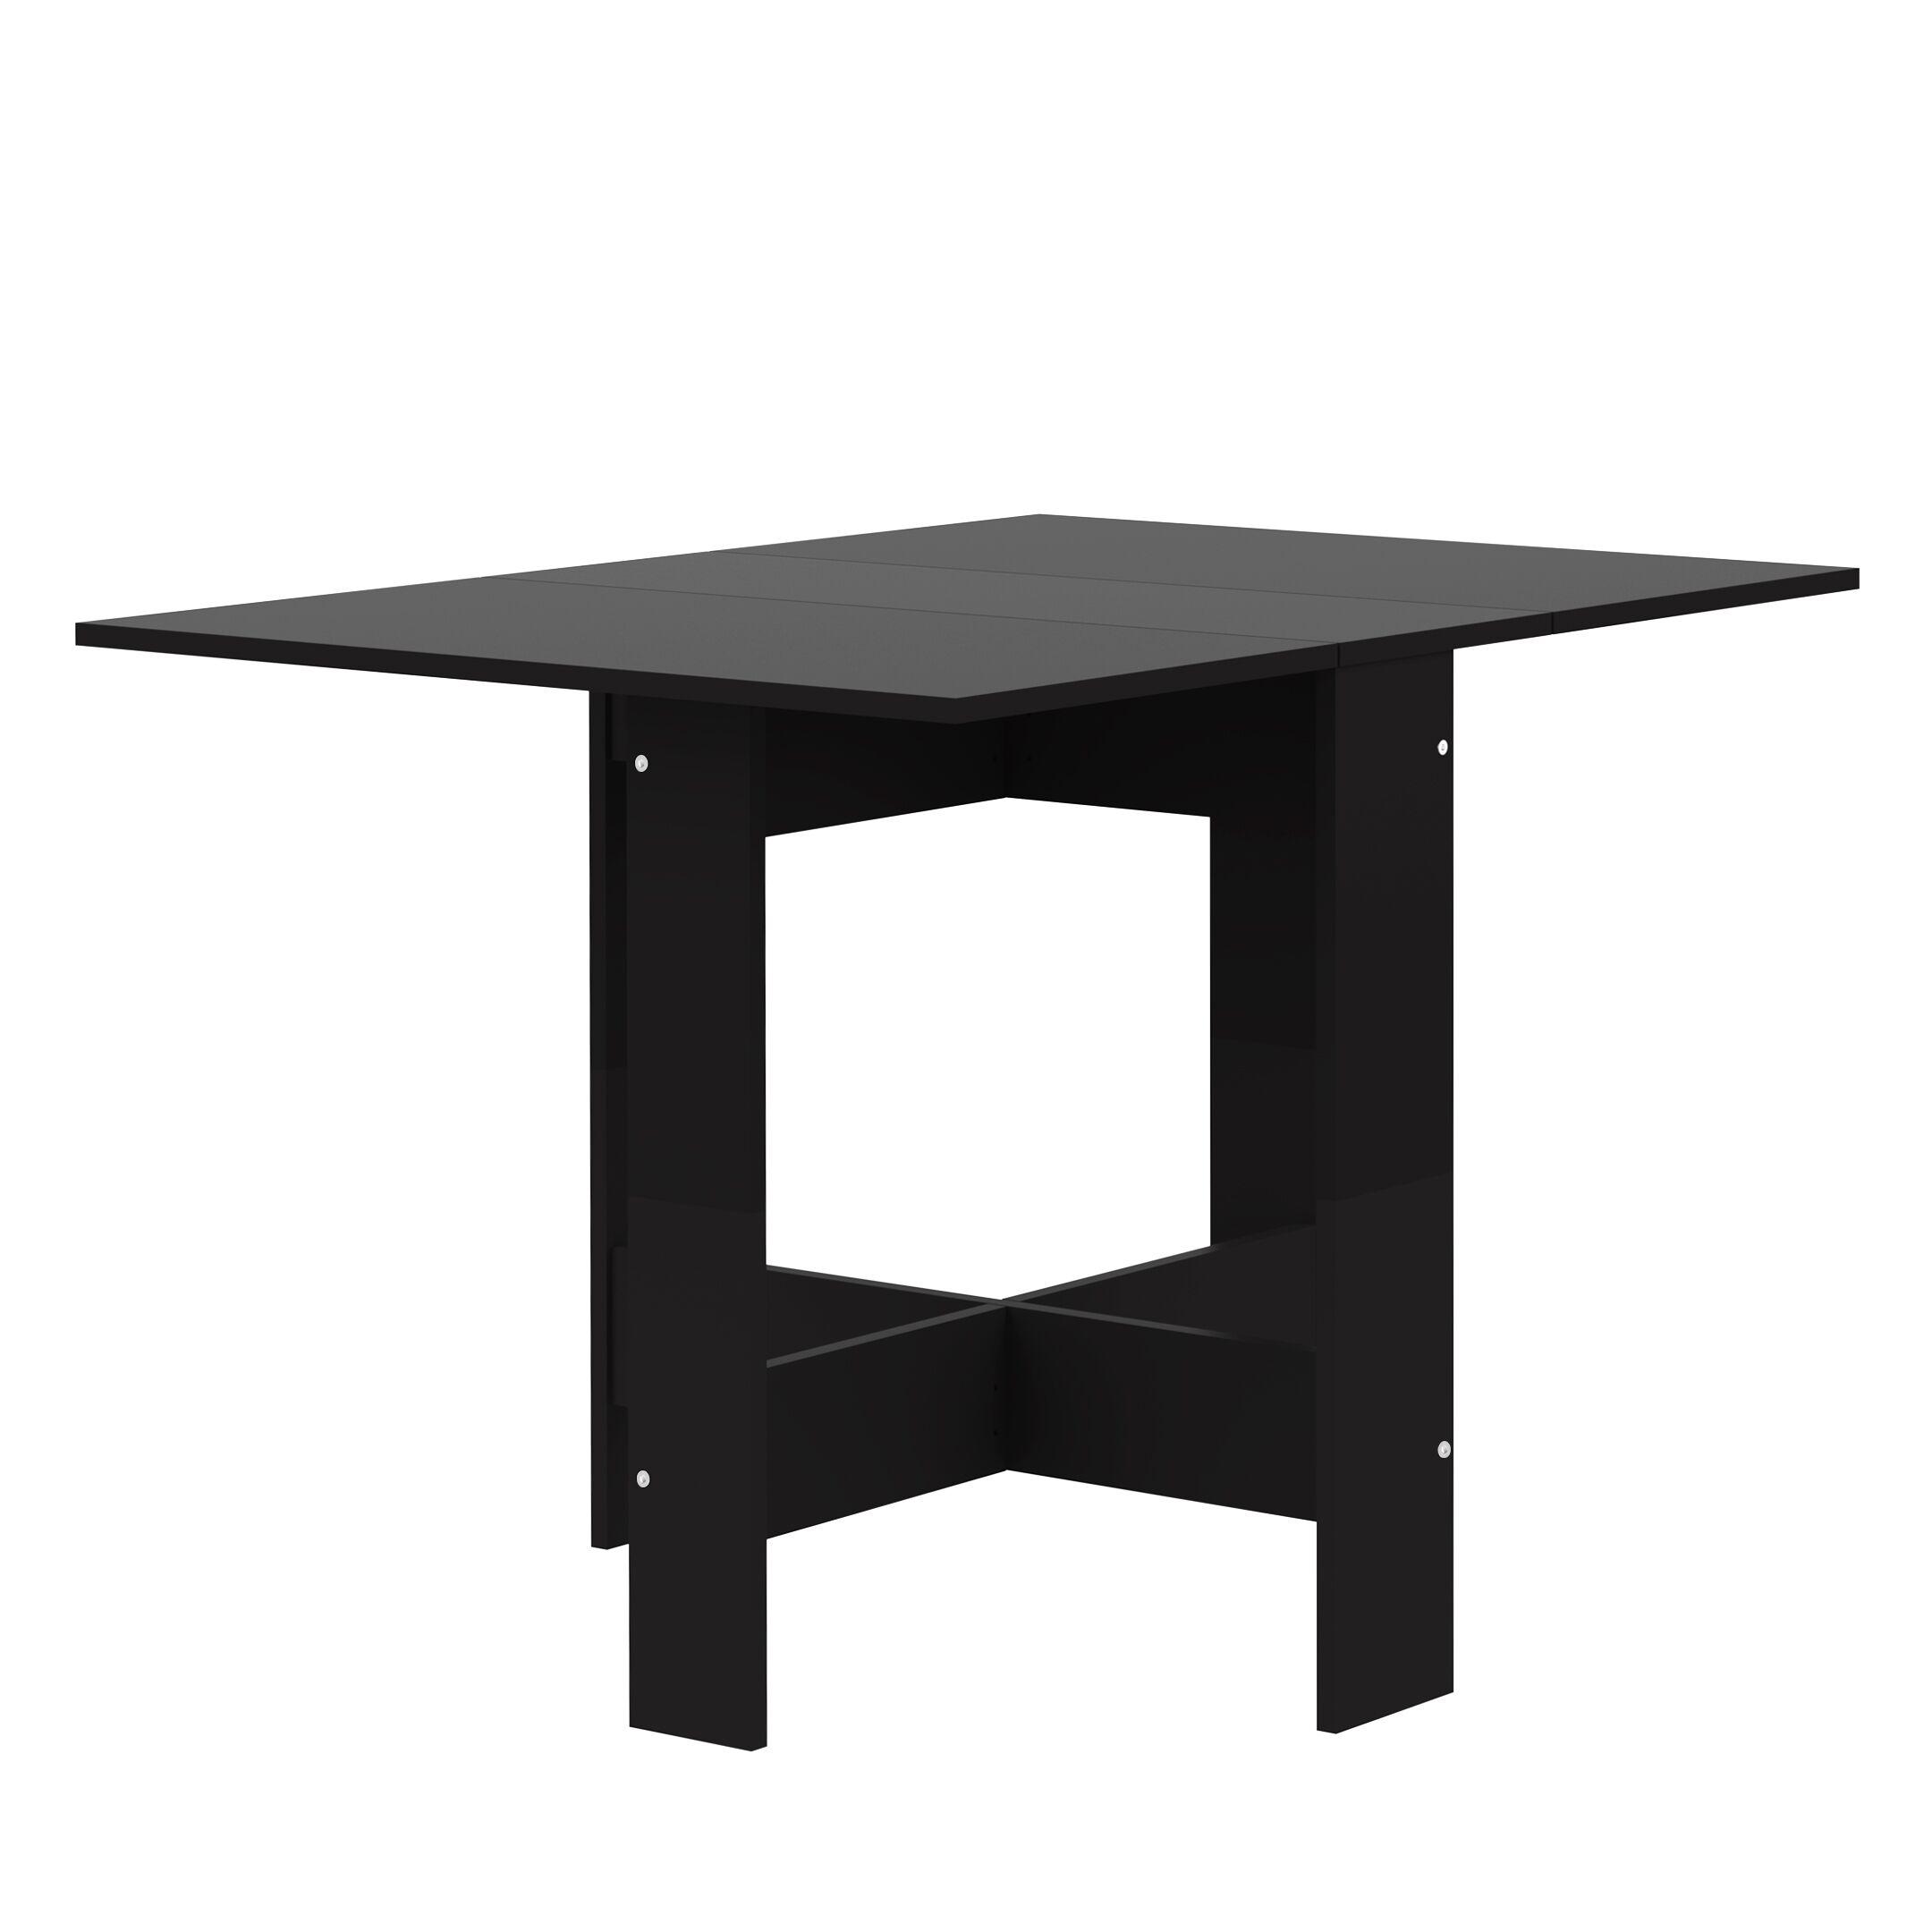 Fairgrove Foldable Dining Table Color: Black